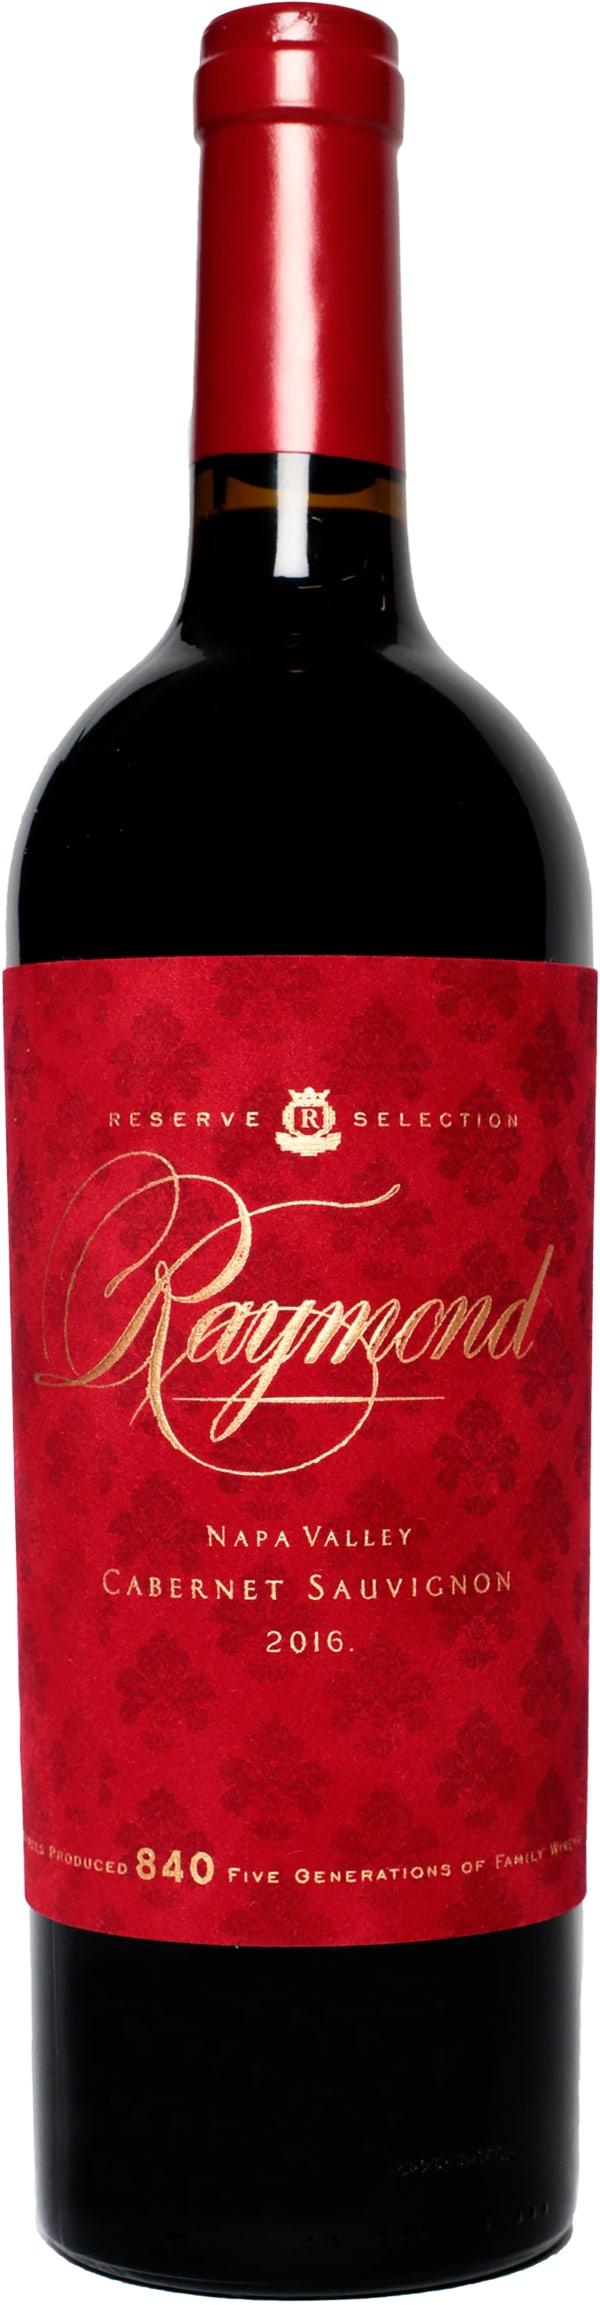 Raymond Reserve Selection Cabernet Sauvignon 2013